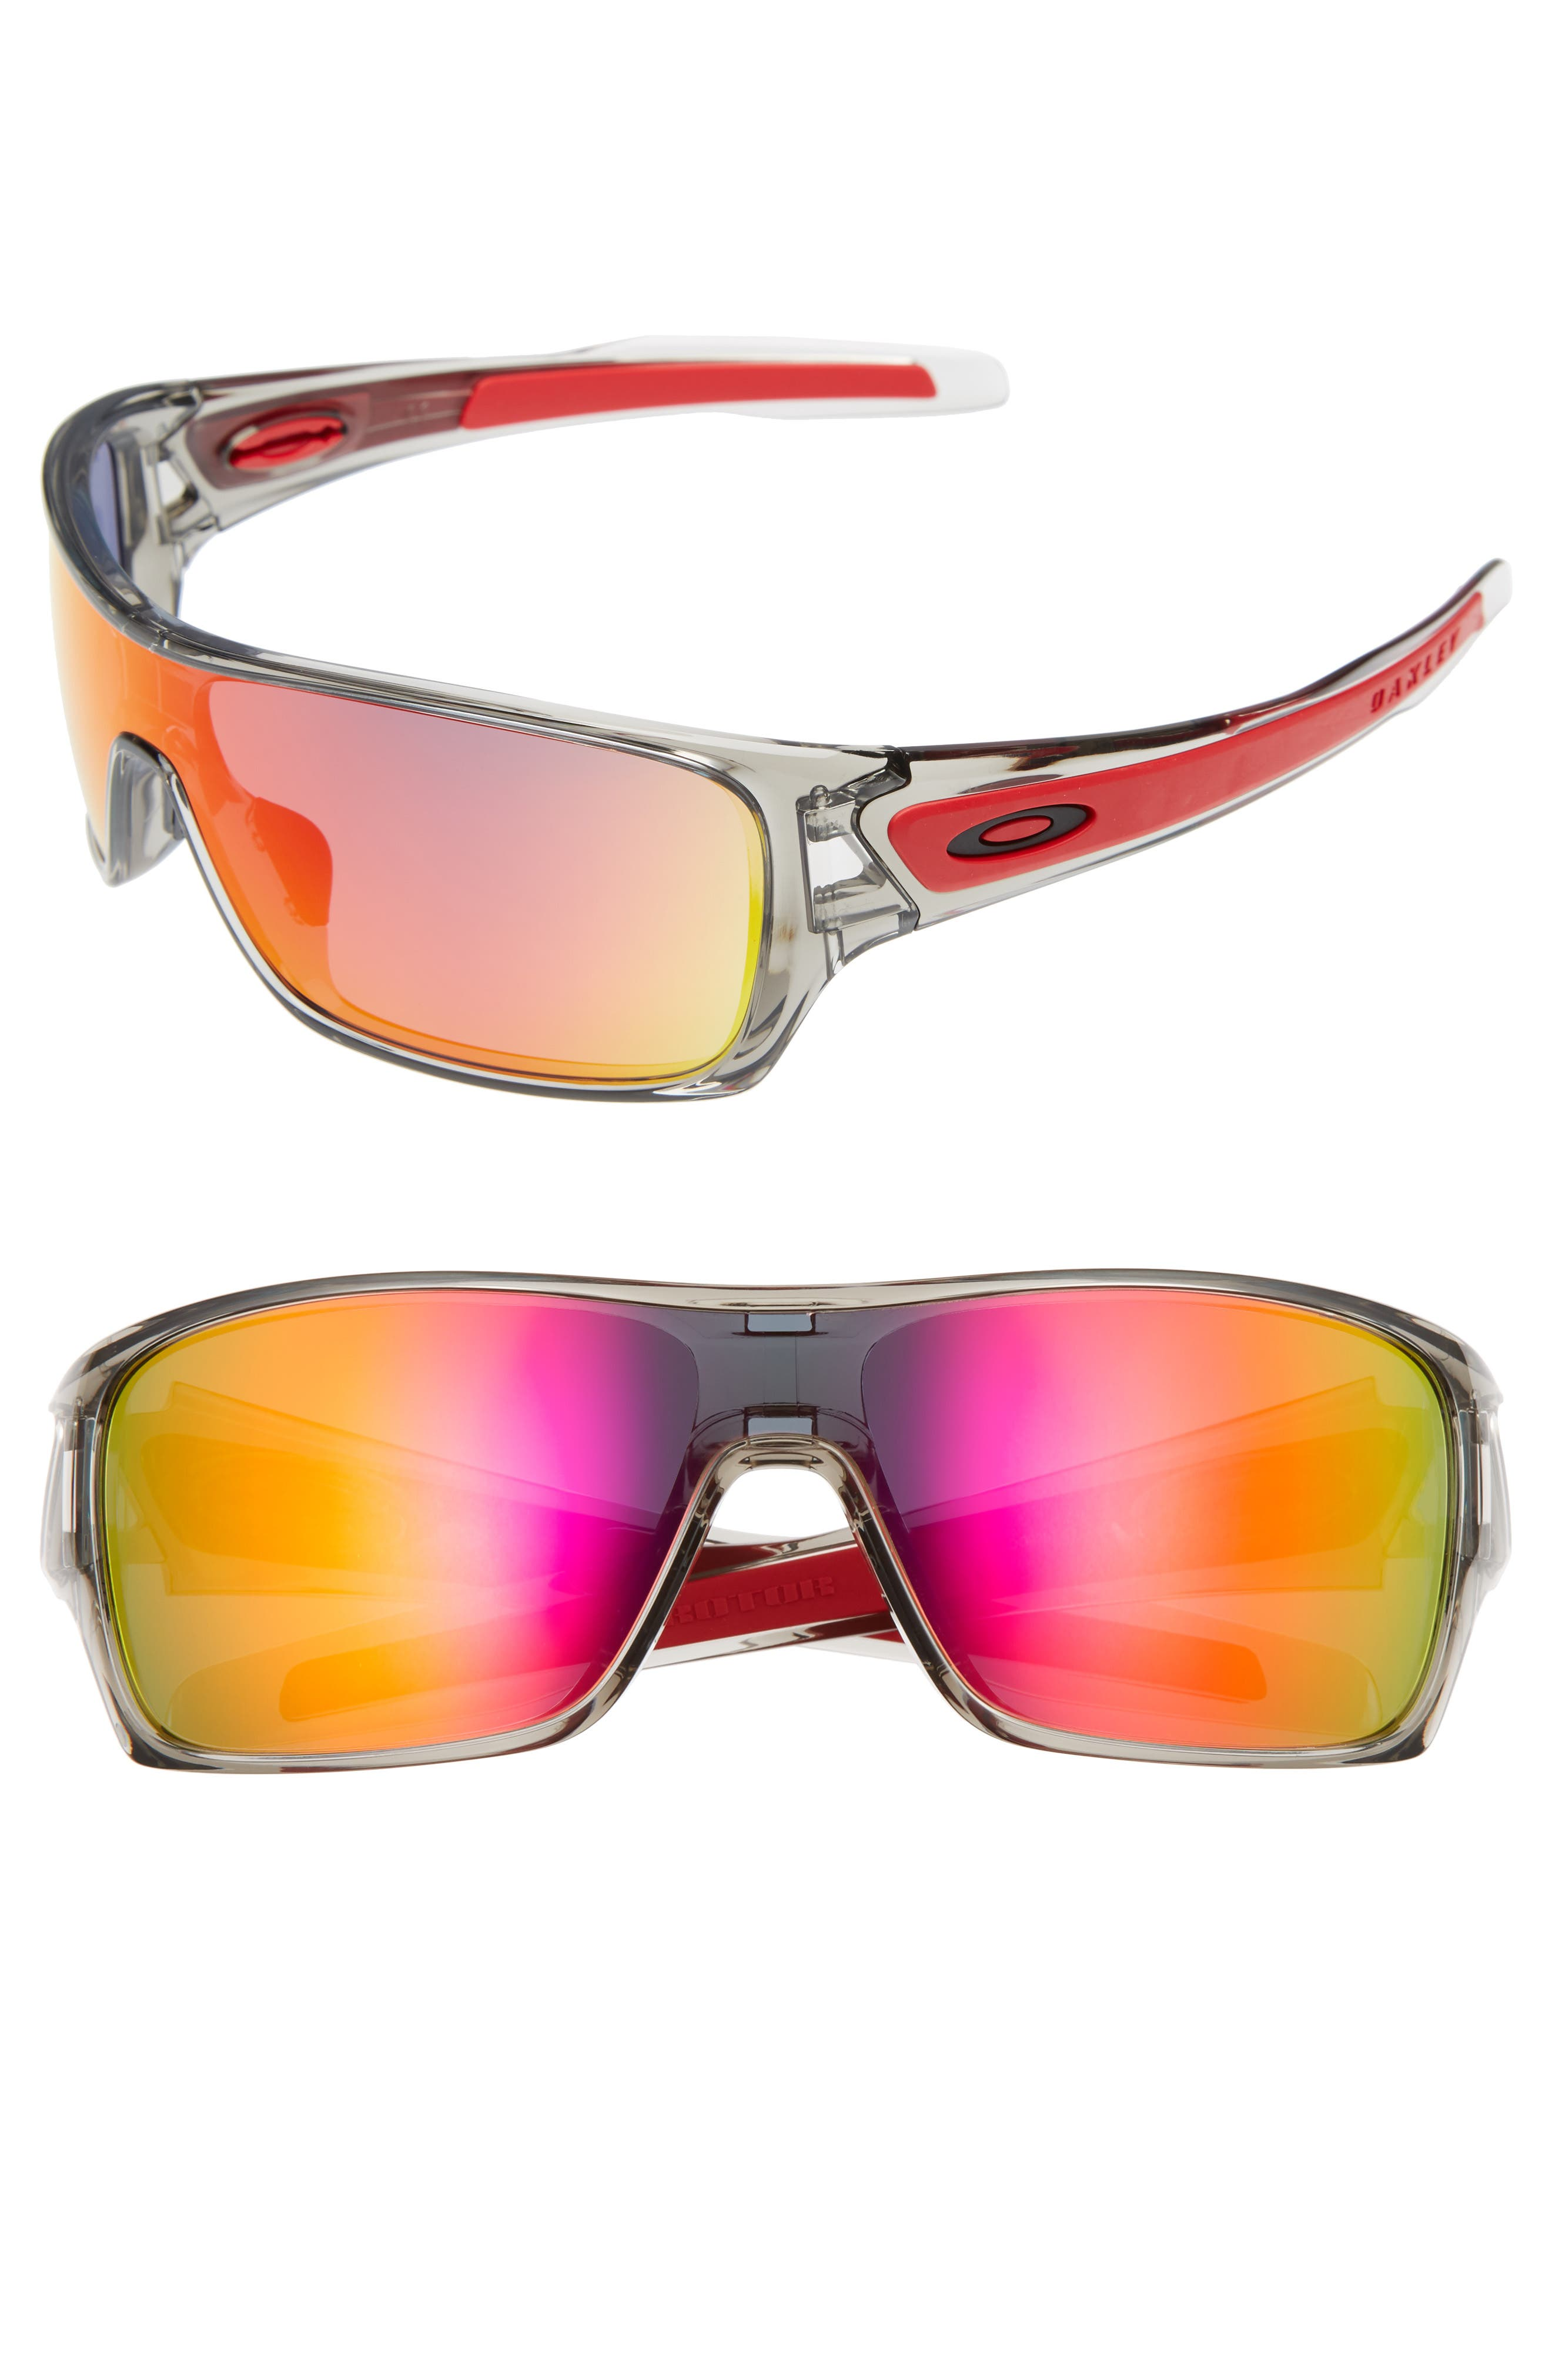 OAKLEY, Turbine Rotor 70mm Sunglasses, Main thumbnail 1, color, GREY